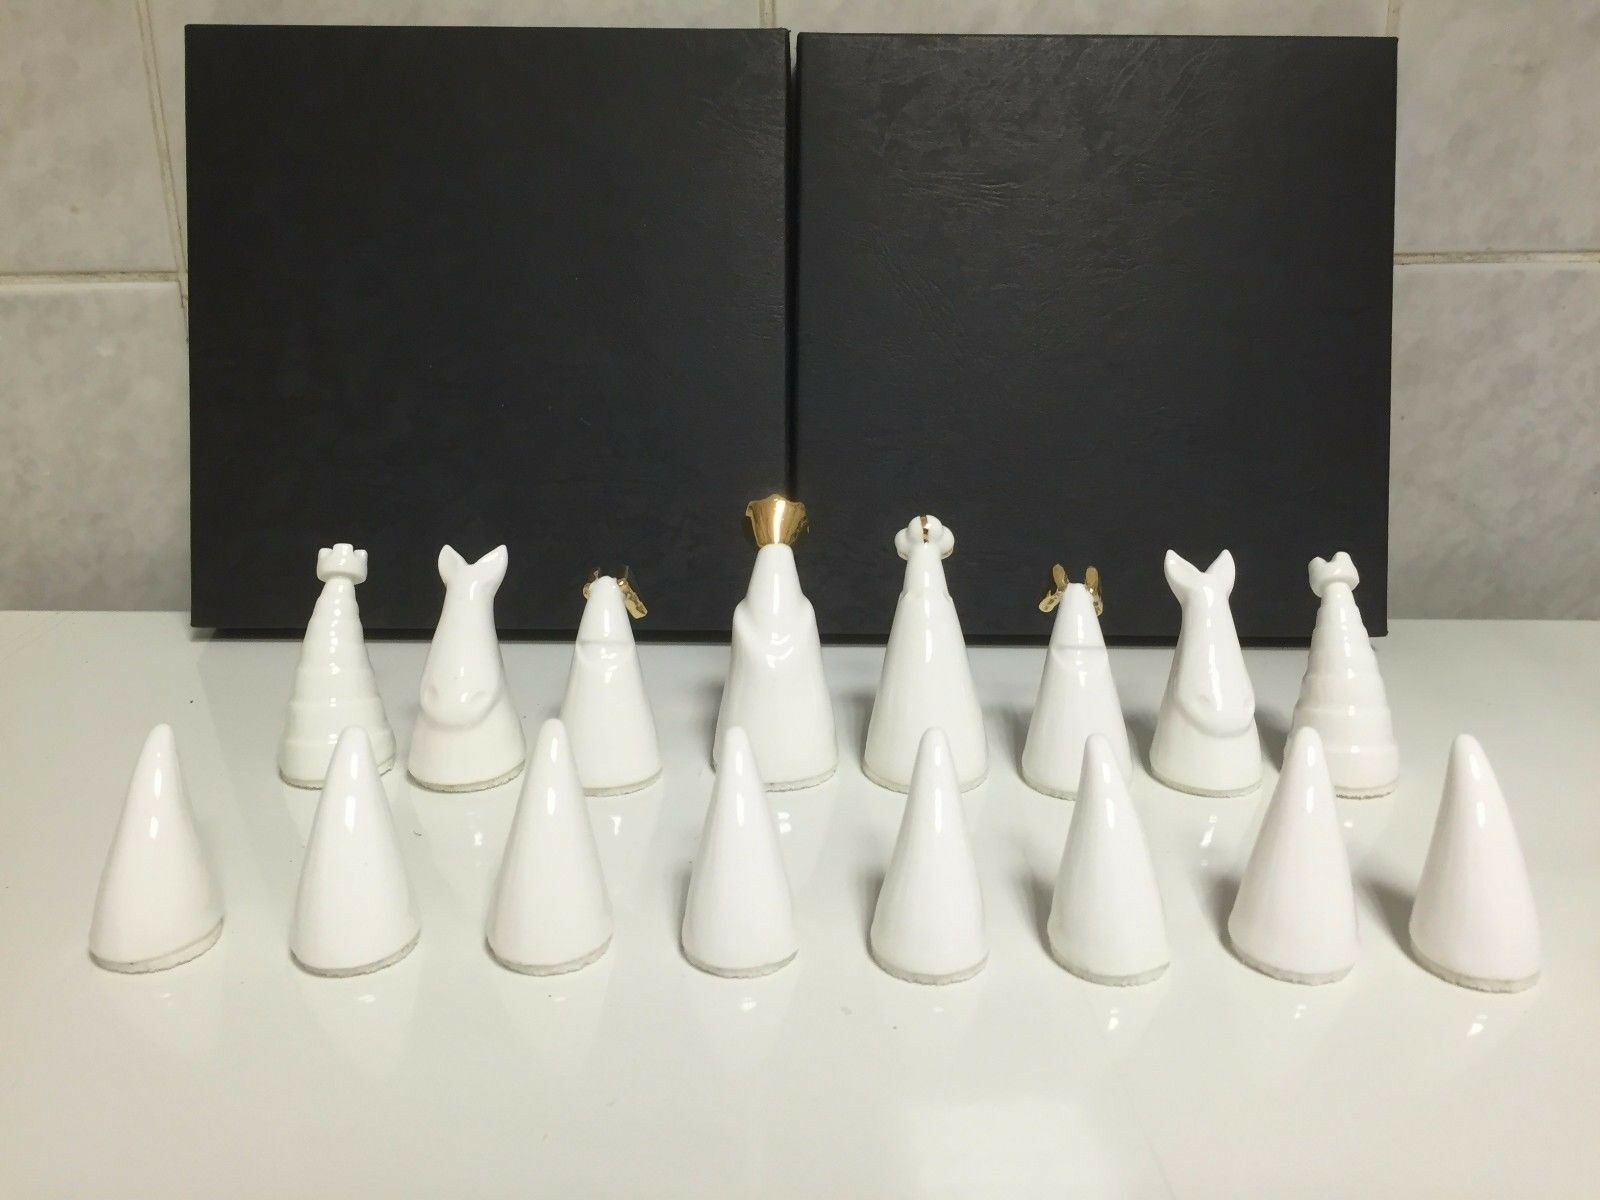 PORCELAIN CHESS SET MADE MADE MADE IN ENGLAND   WITH ORIGINAL BOX c059ad